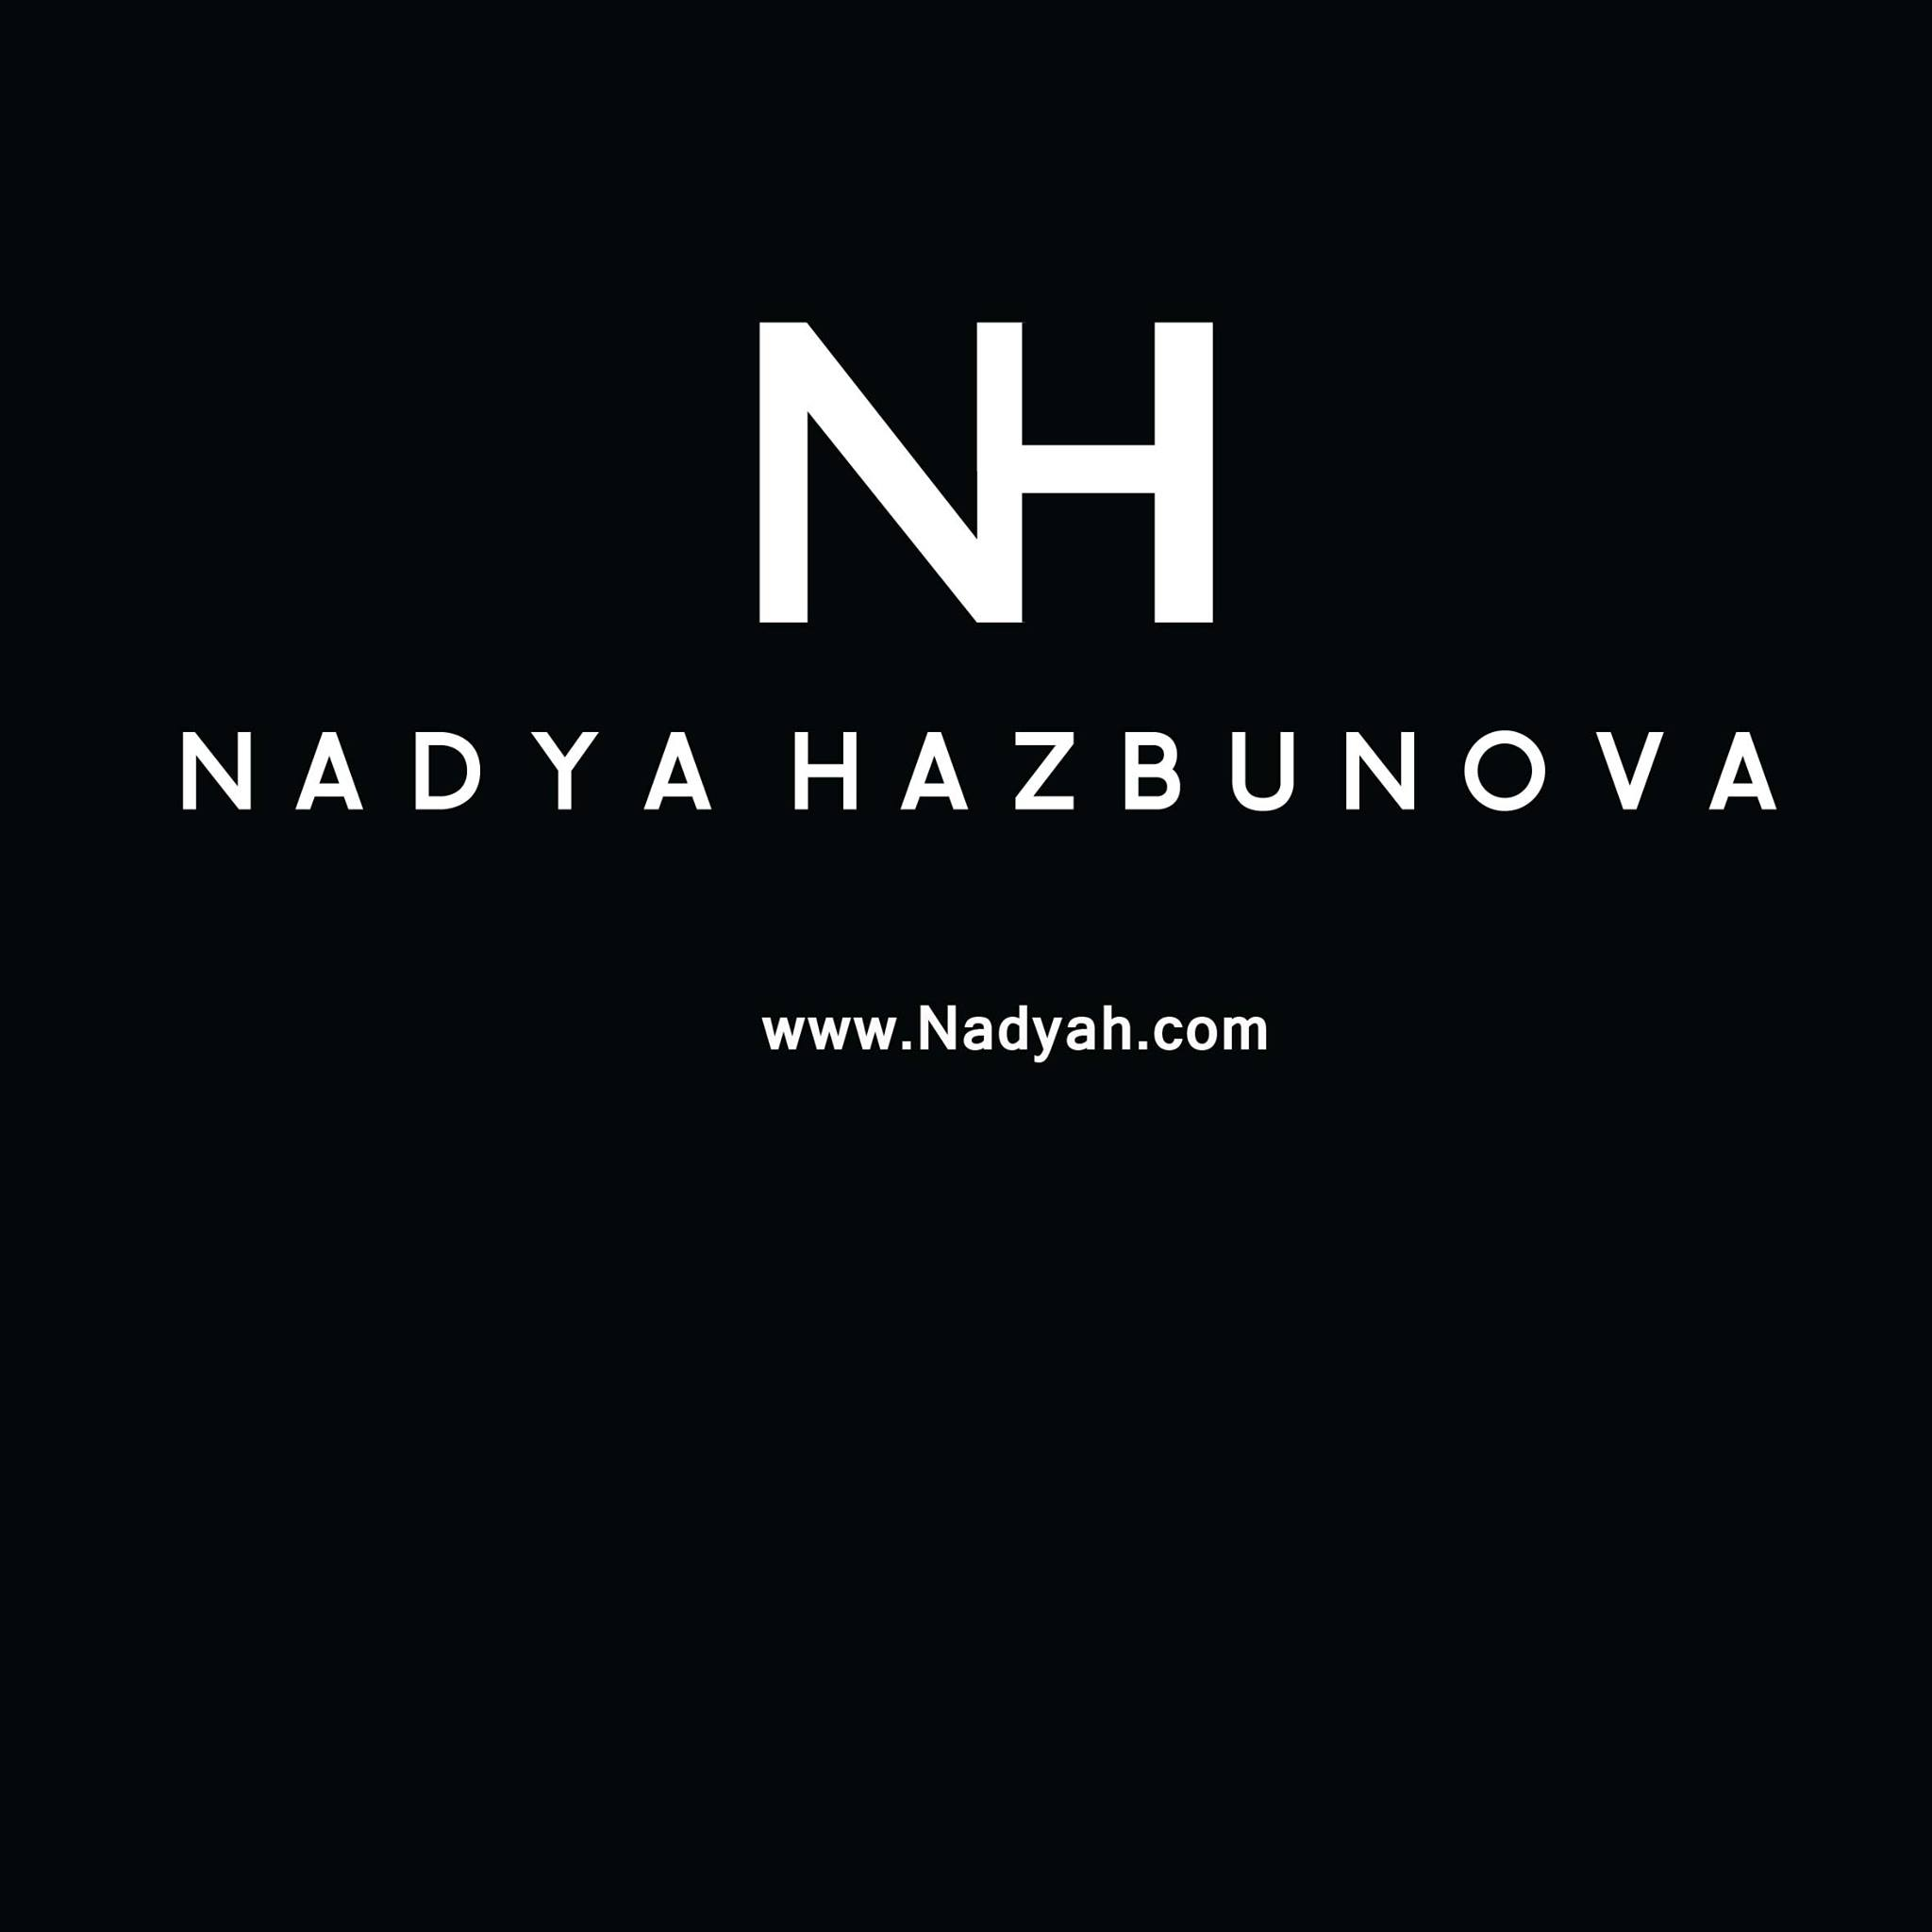 www.nadyah.com